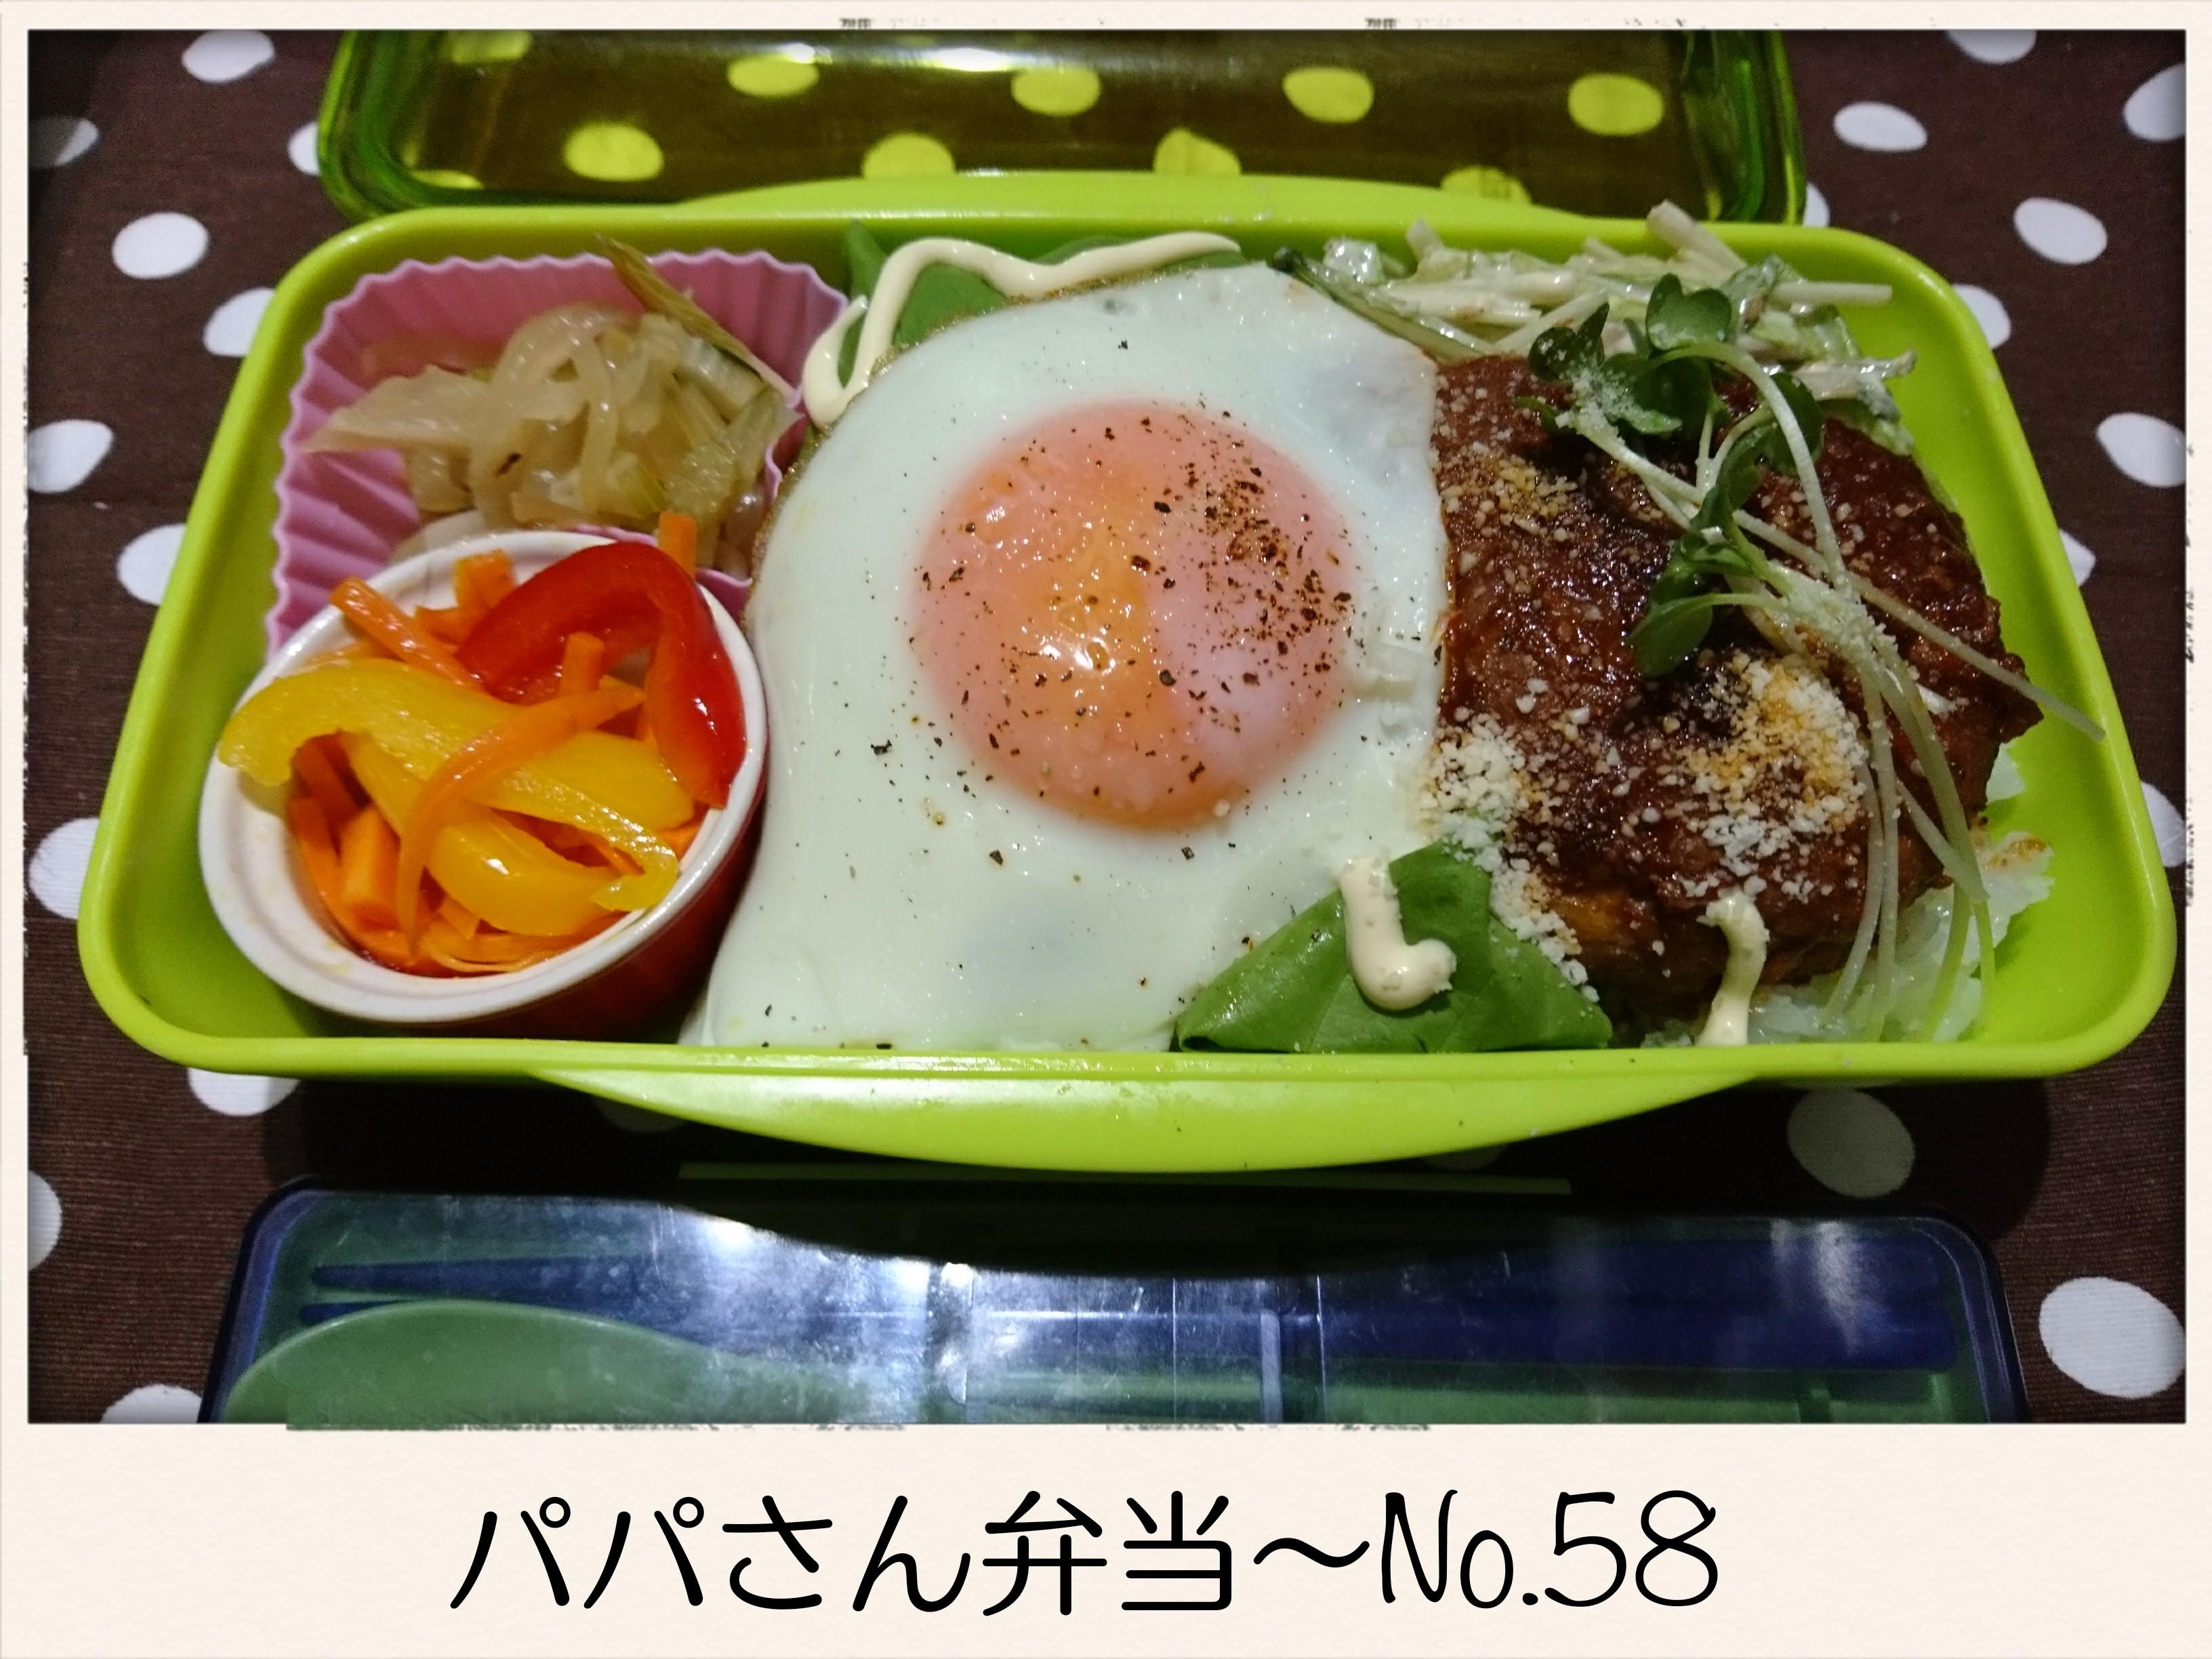 moblog_83850093.jpg